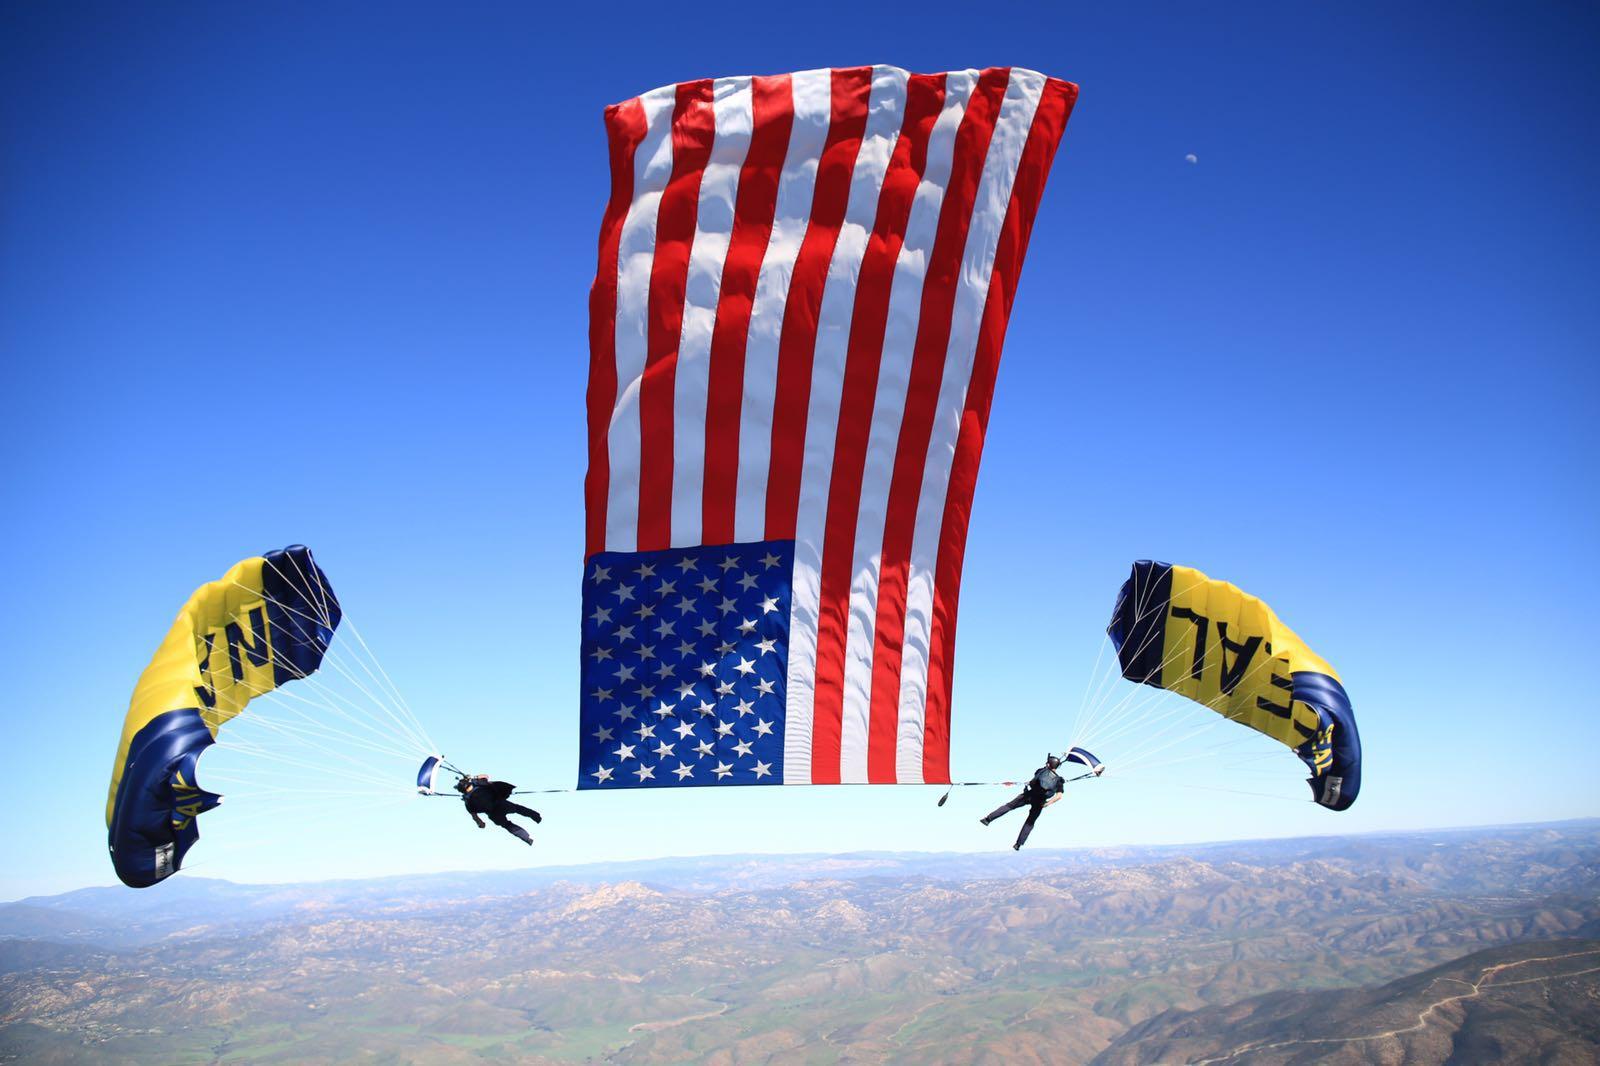 Navy Parachute Team